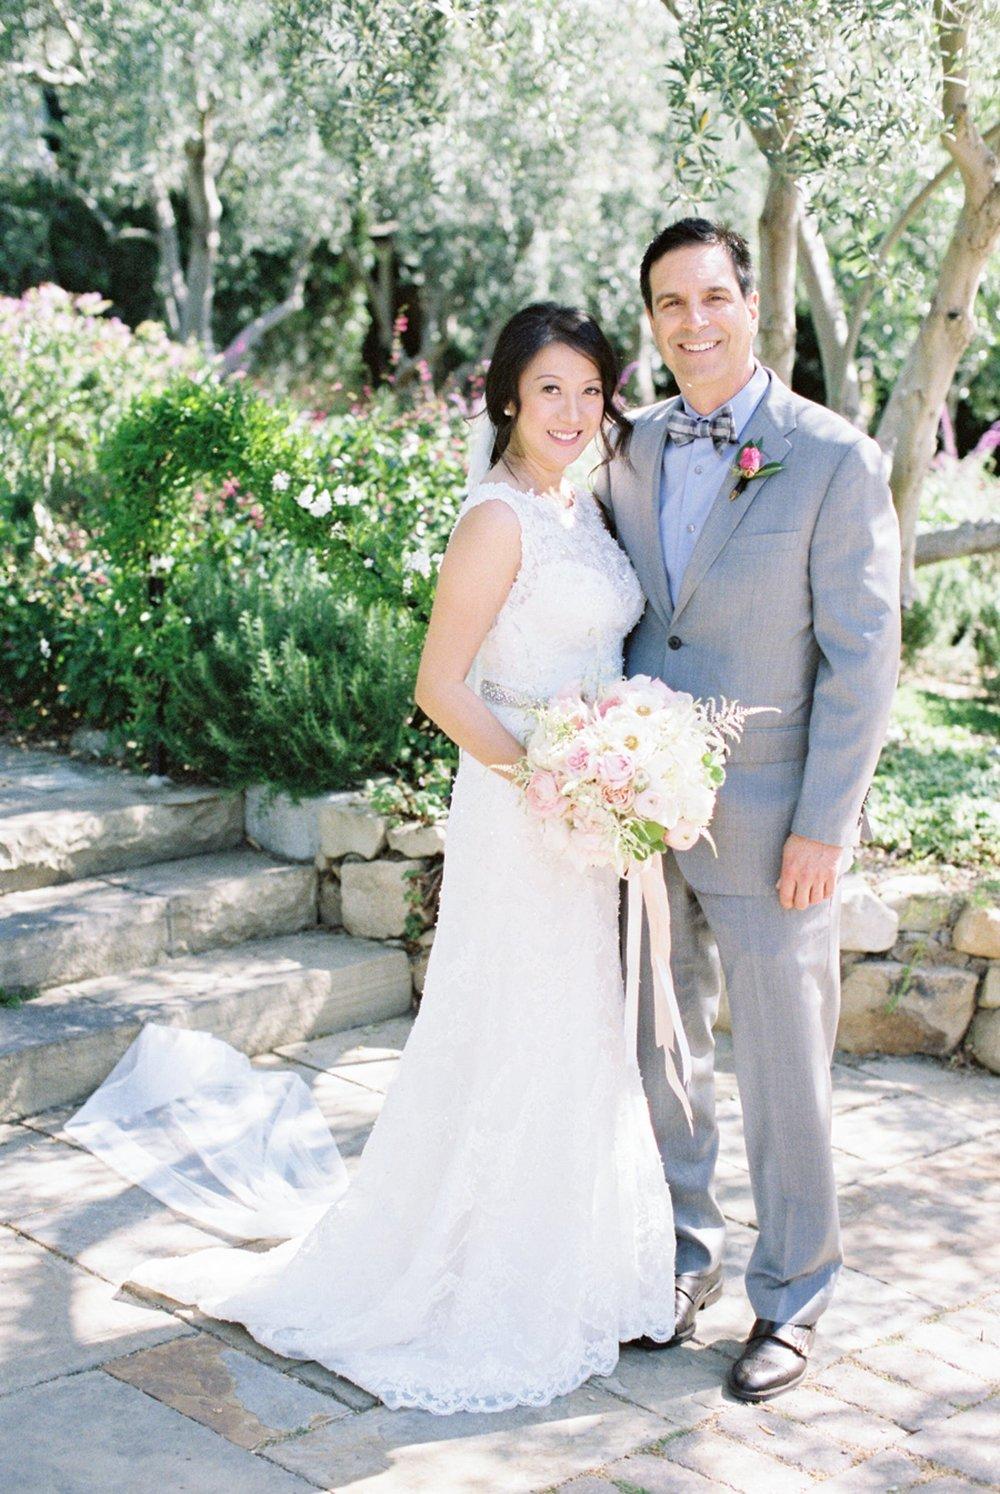 www.santabarbarawedding.com   Michael + Anna Costa Photography   San Ysidro Ranch   Twine Events   Coco Rose Design   Bride and Groom Pose